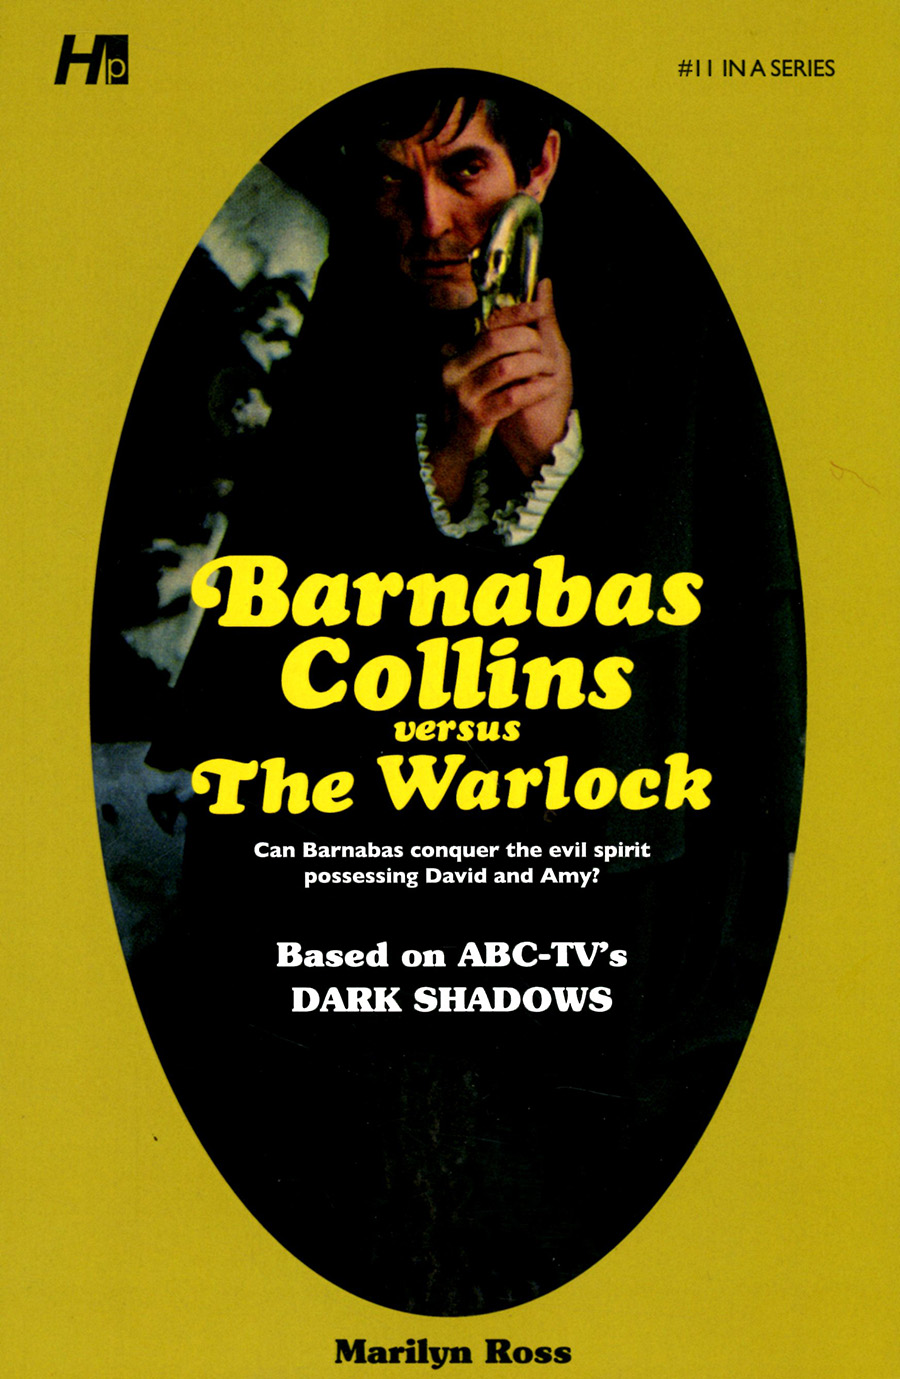 Dark Shadows Paperback Library Novel Vol 11 Barnabas Collins vs The Warlock TP